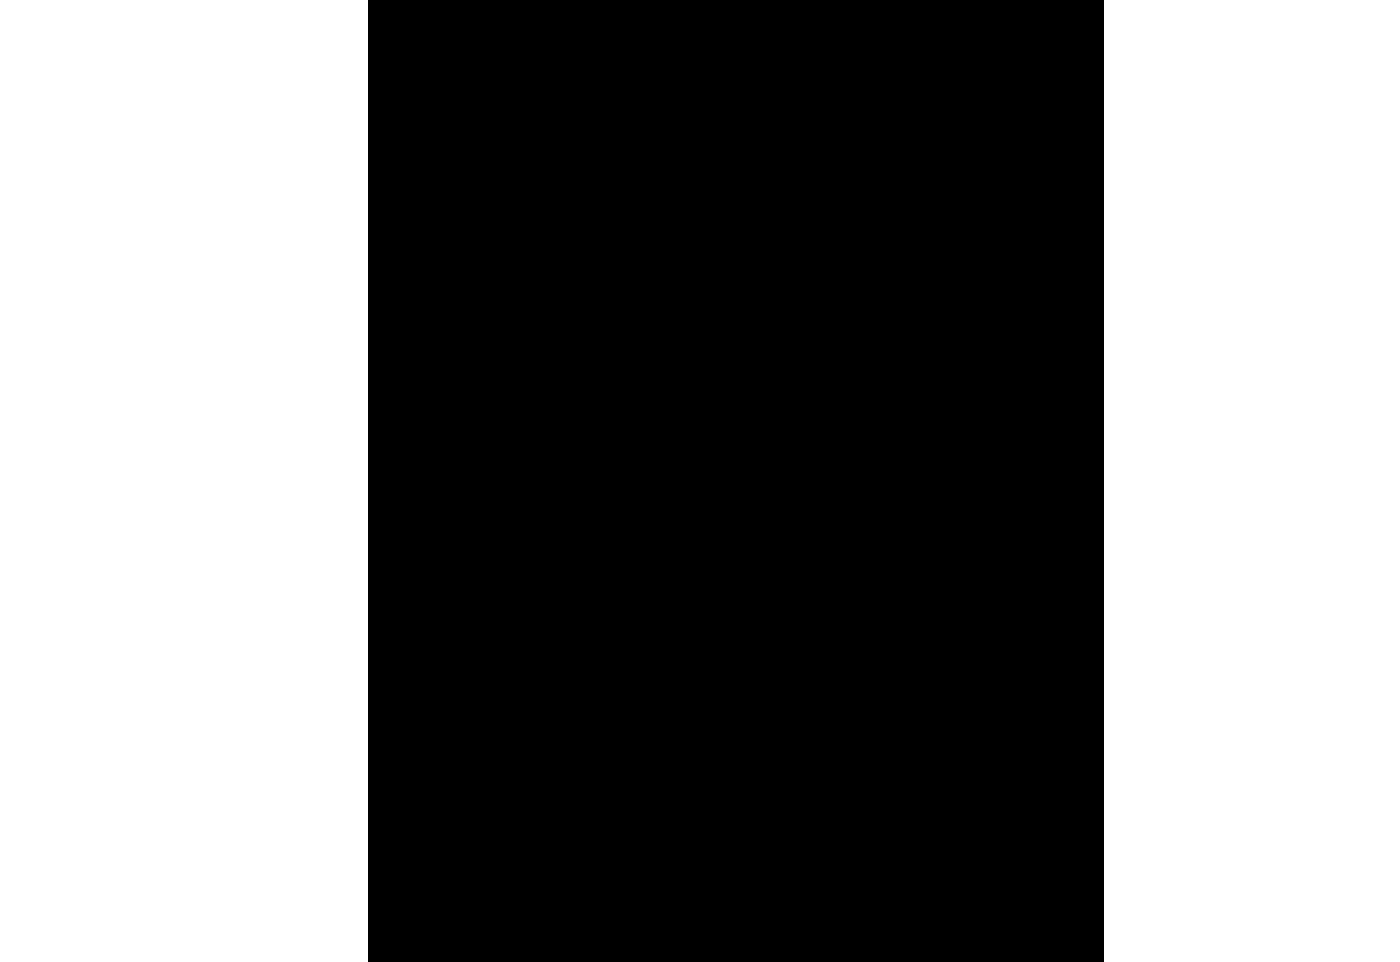 Blackheart Salon Secondary Logo